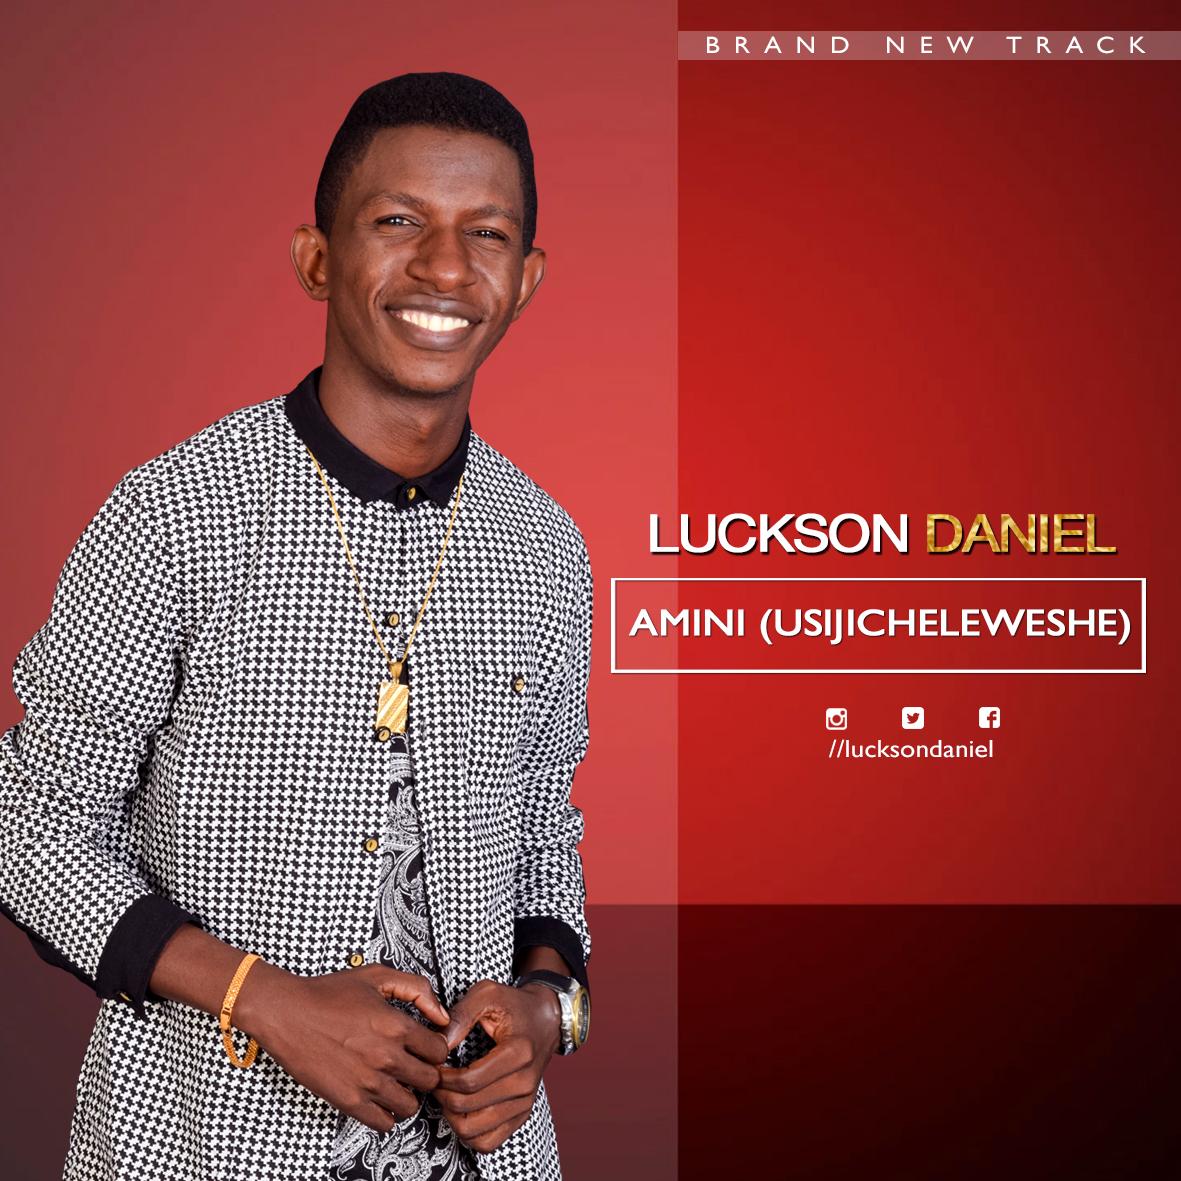 Luckson Daniel - Amini